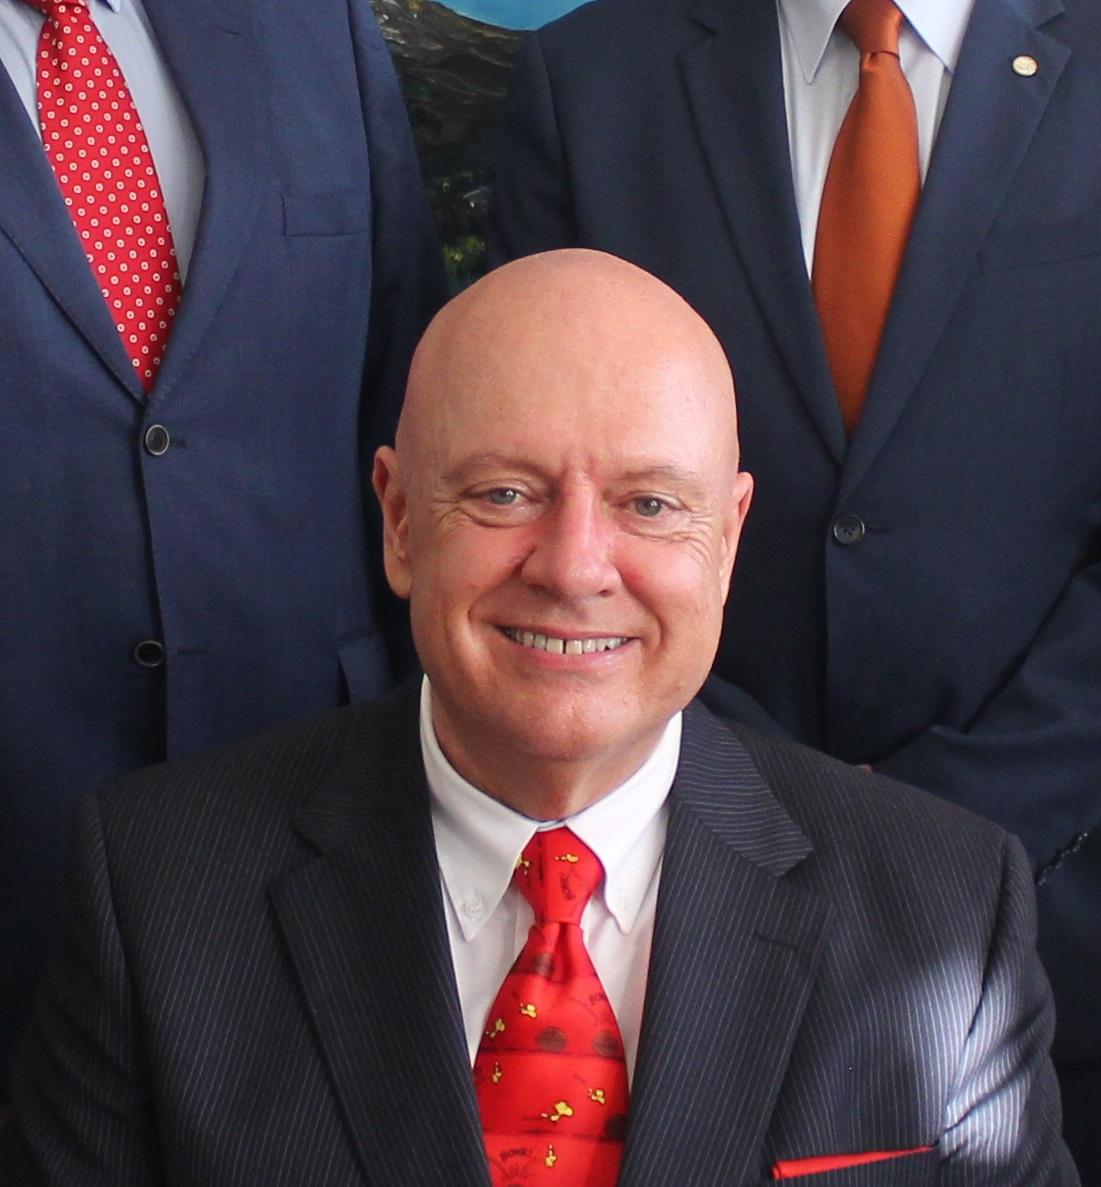 Eduardo Silva, Azores Promotion Board, Ponta Delgada, Azores, Portugal